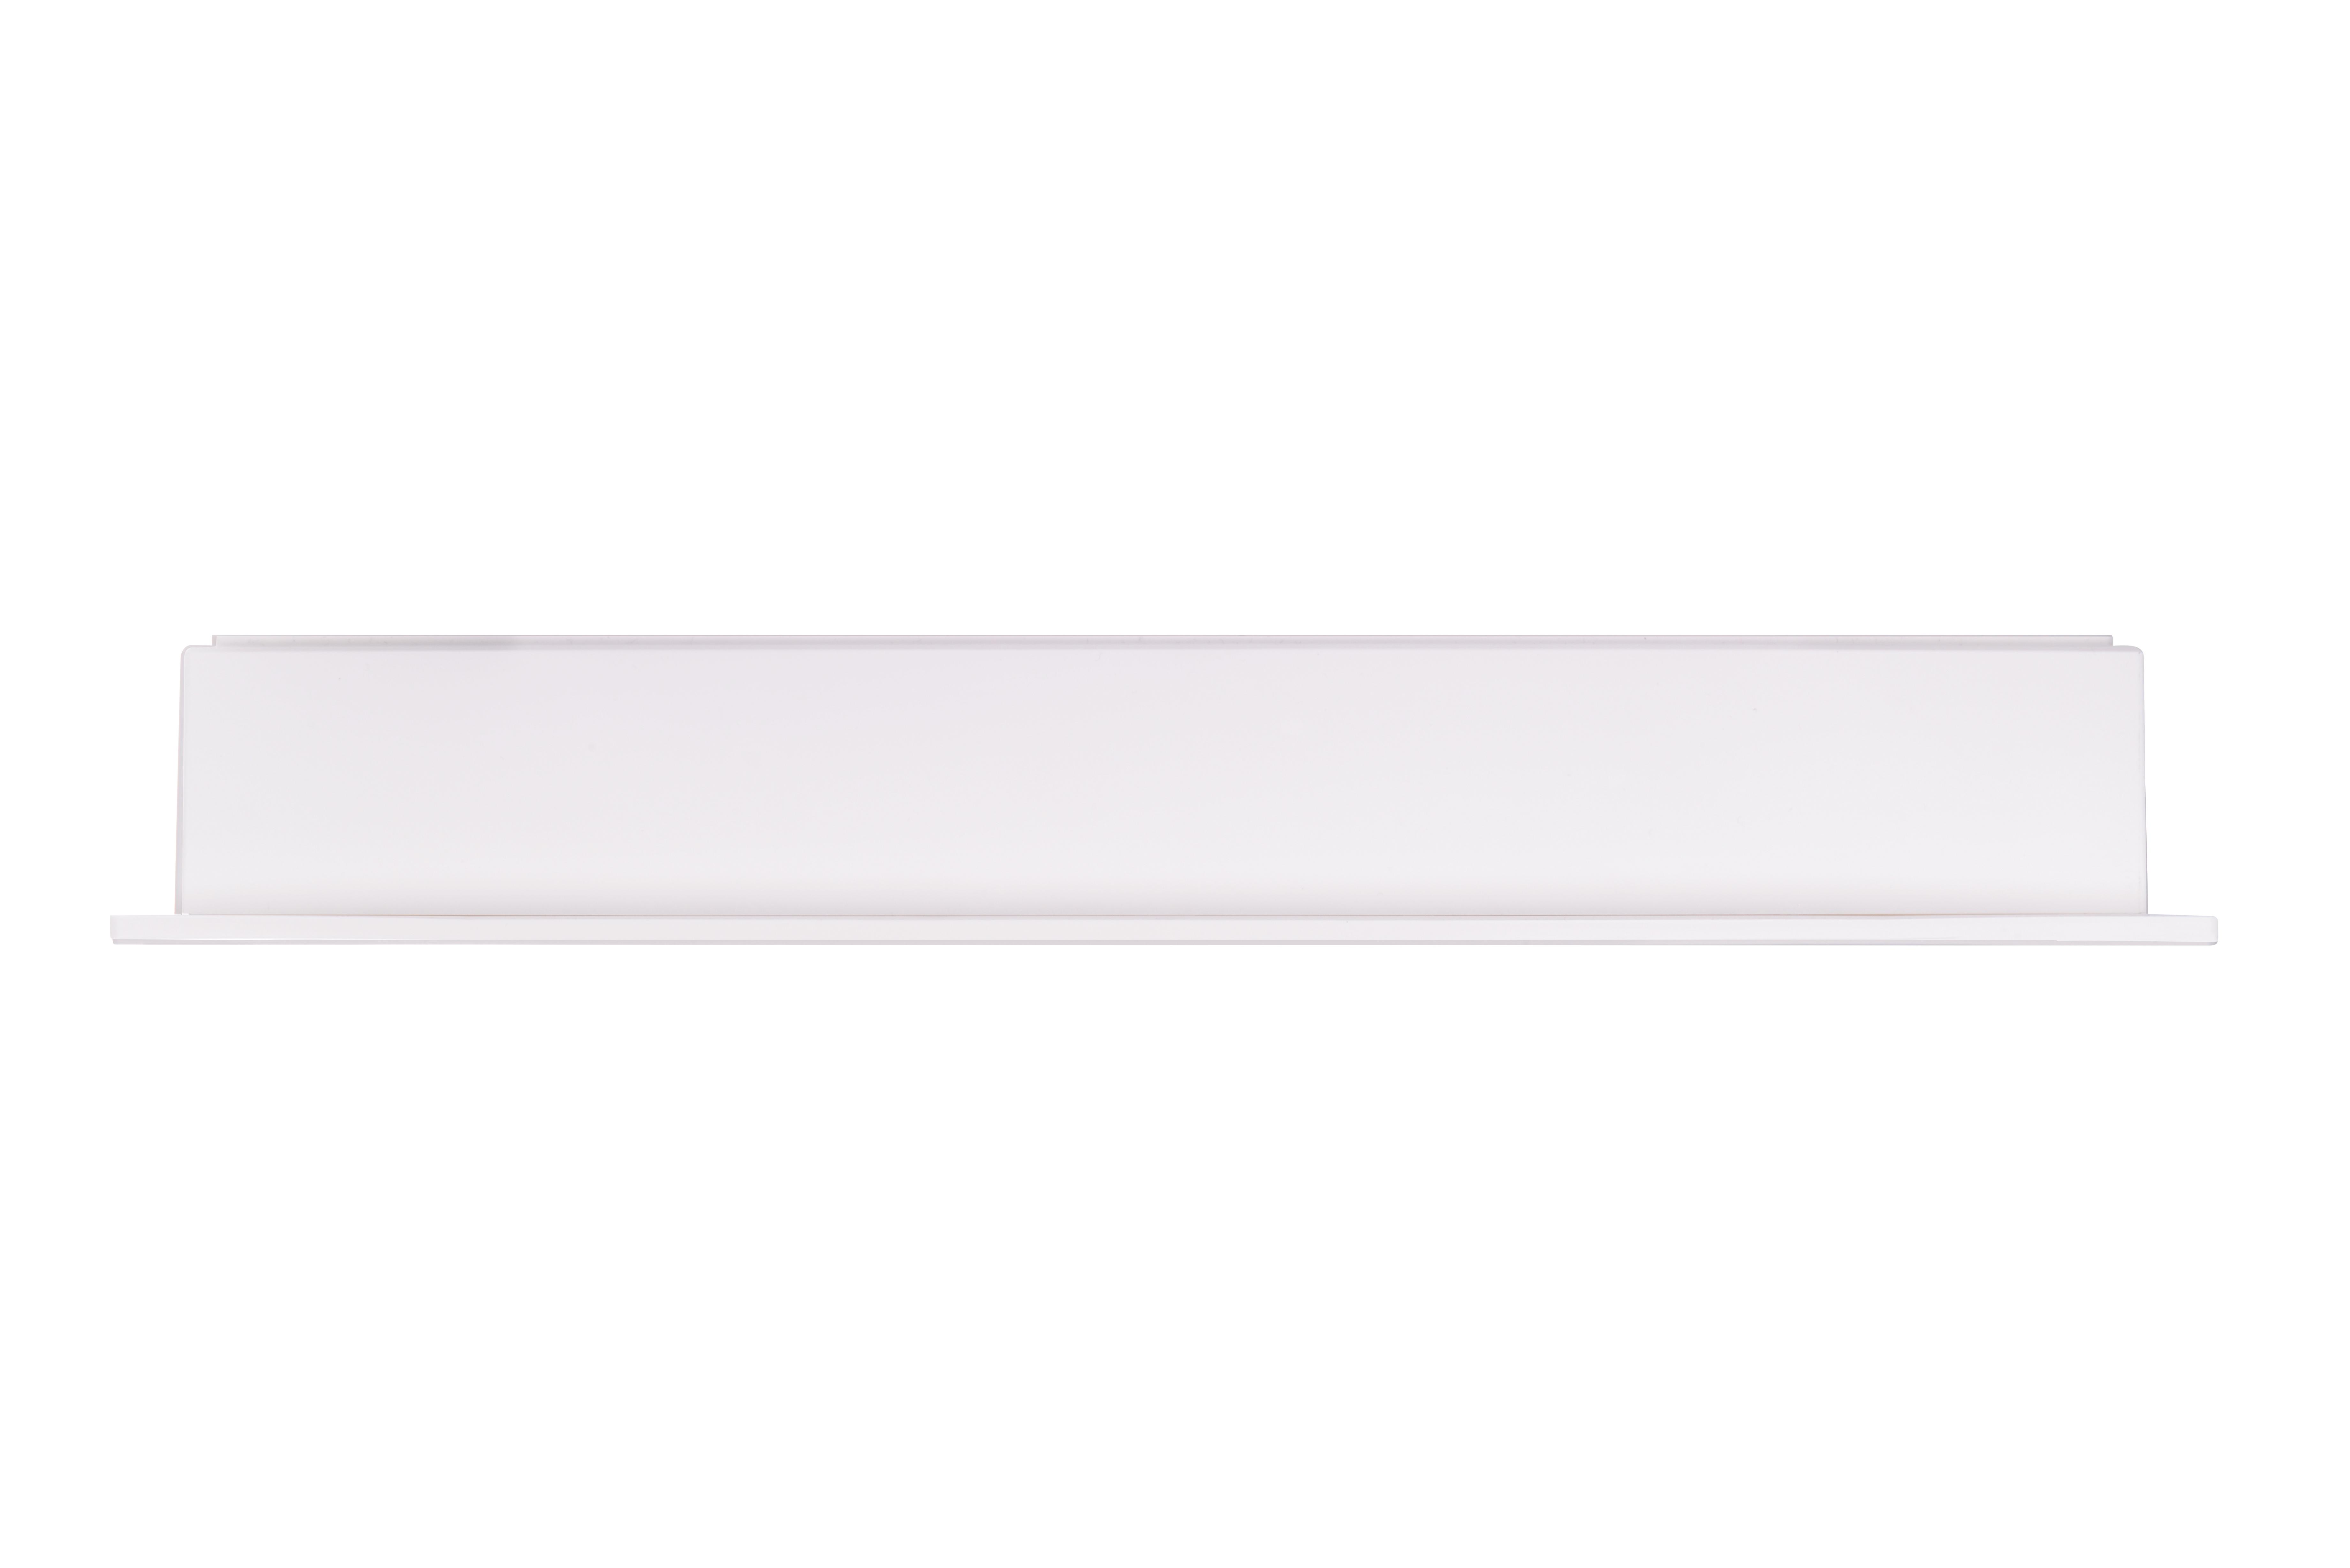 Lampa emergenta led Intelight 94521   3h mentinut test automat 5